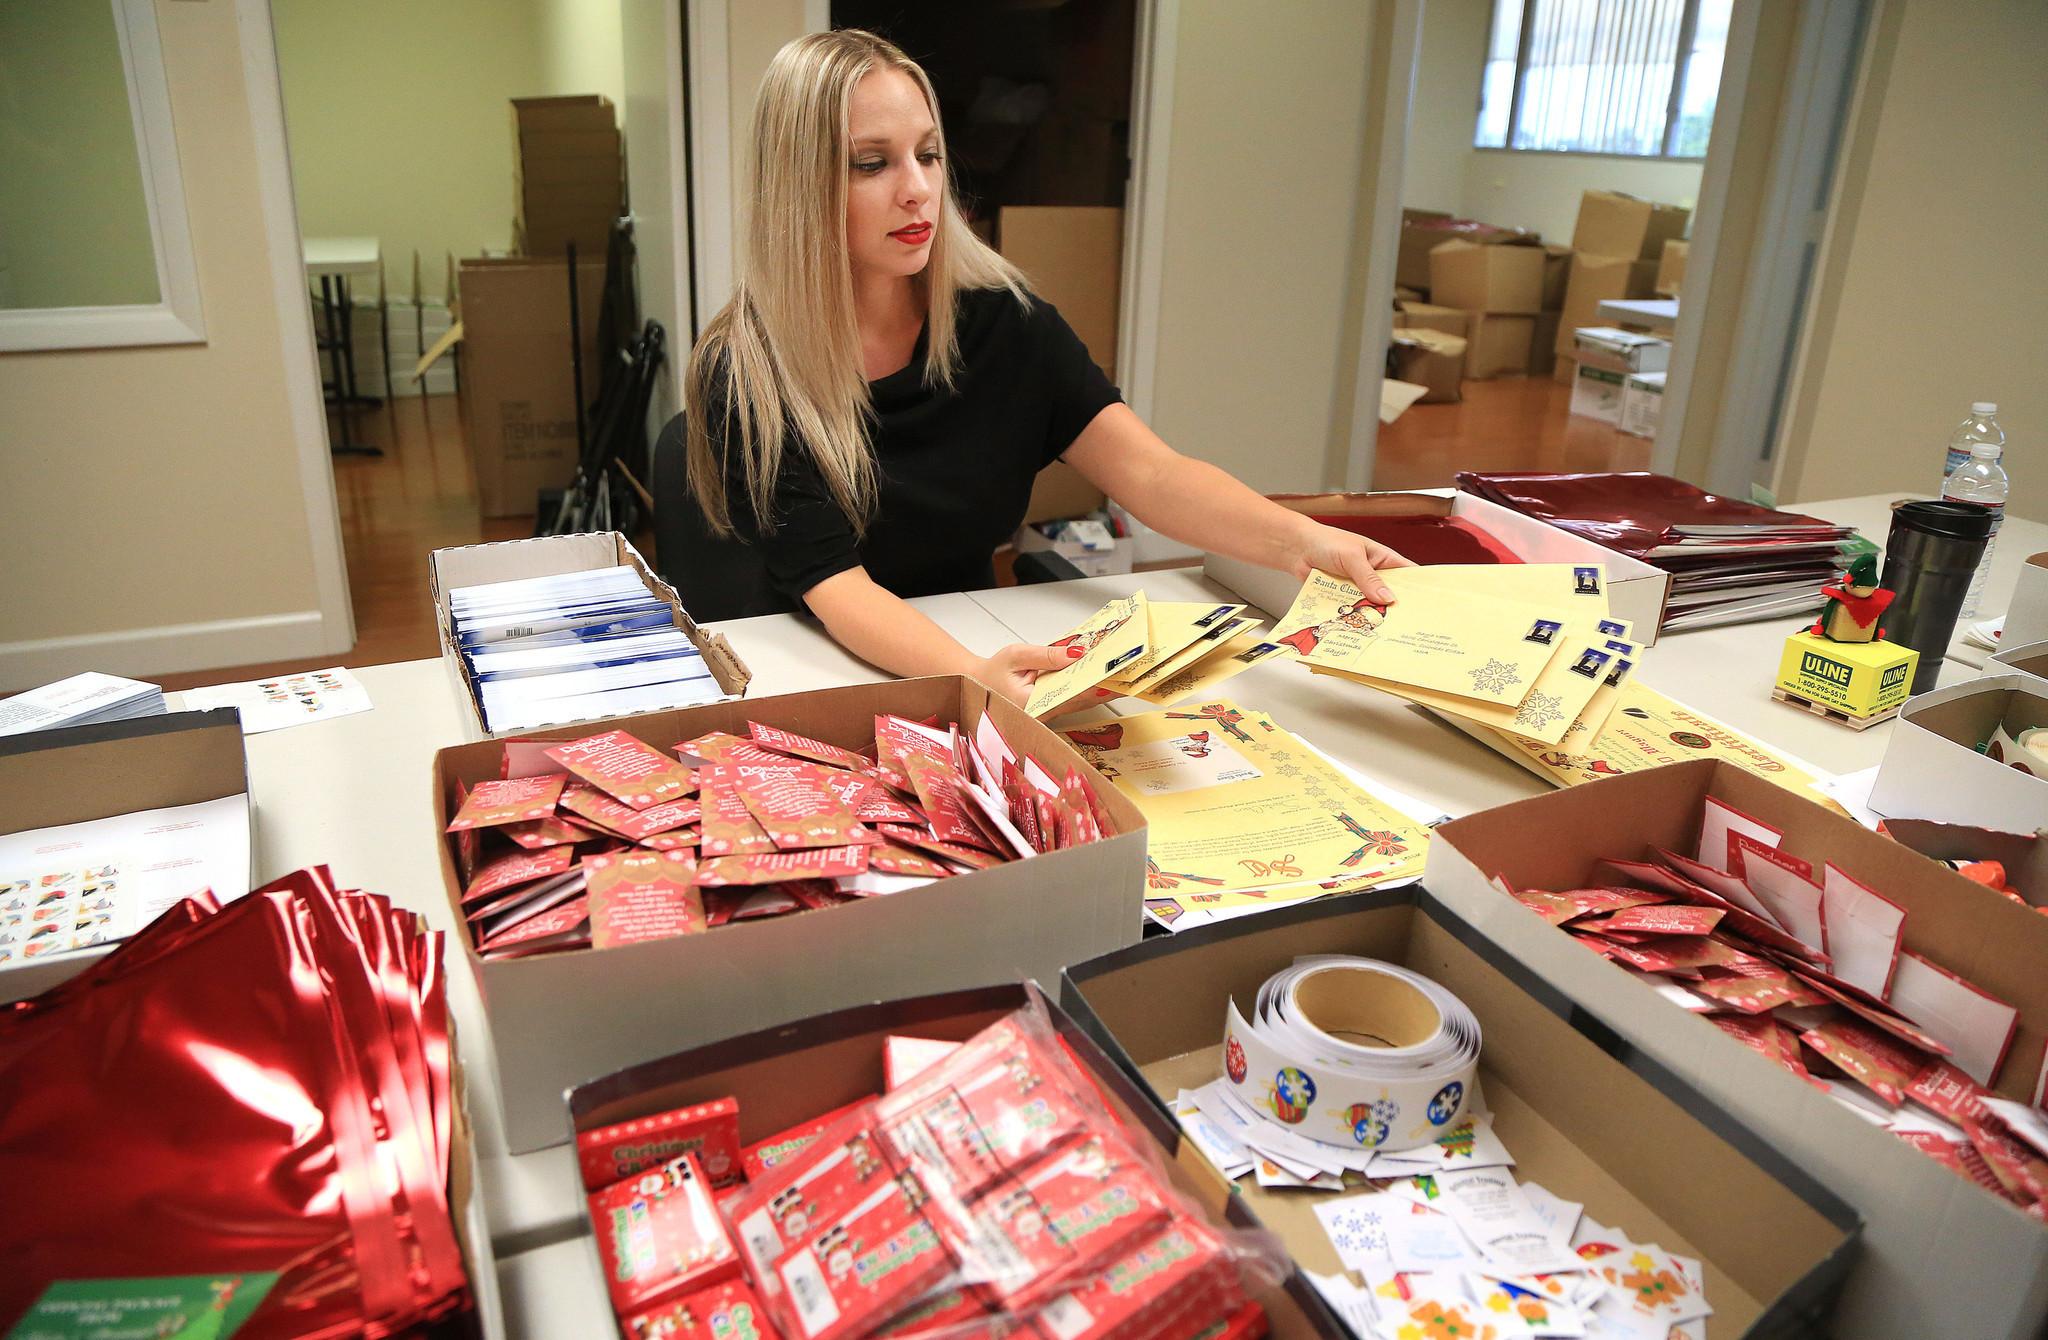 Boca raton santa business bags shark tank deal sun sentinel spiritdancerdesigns Images